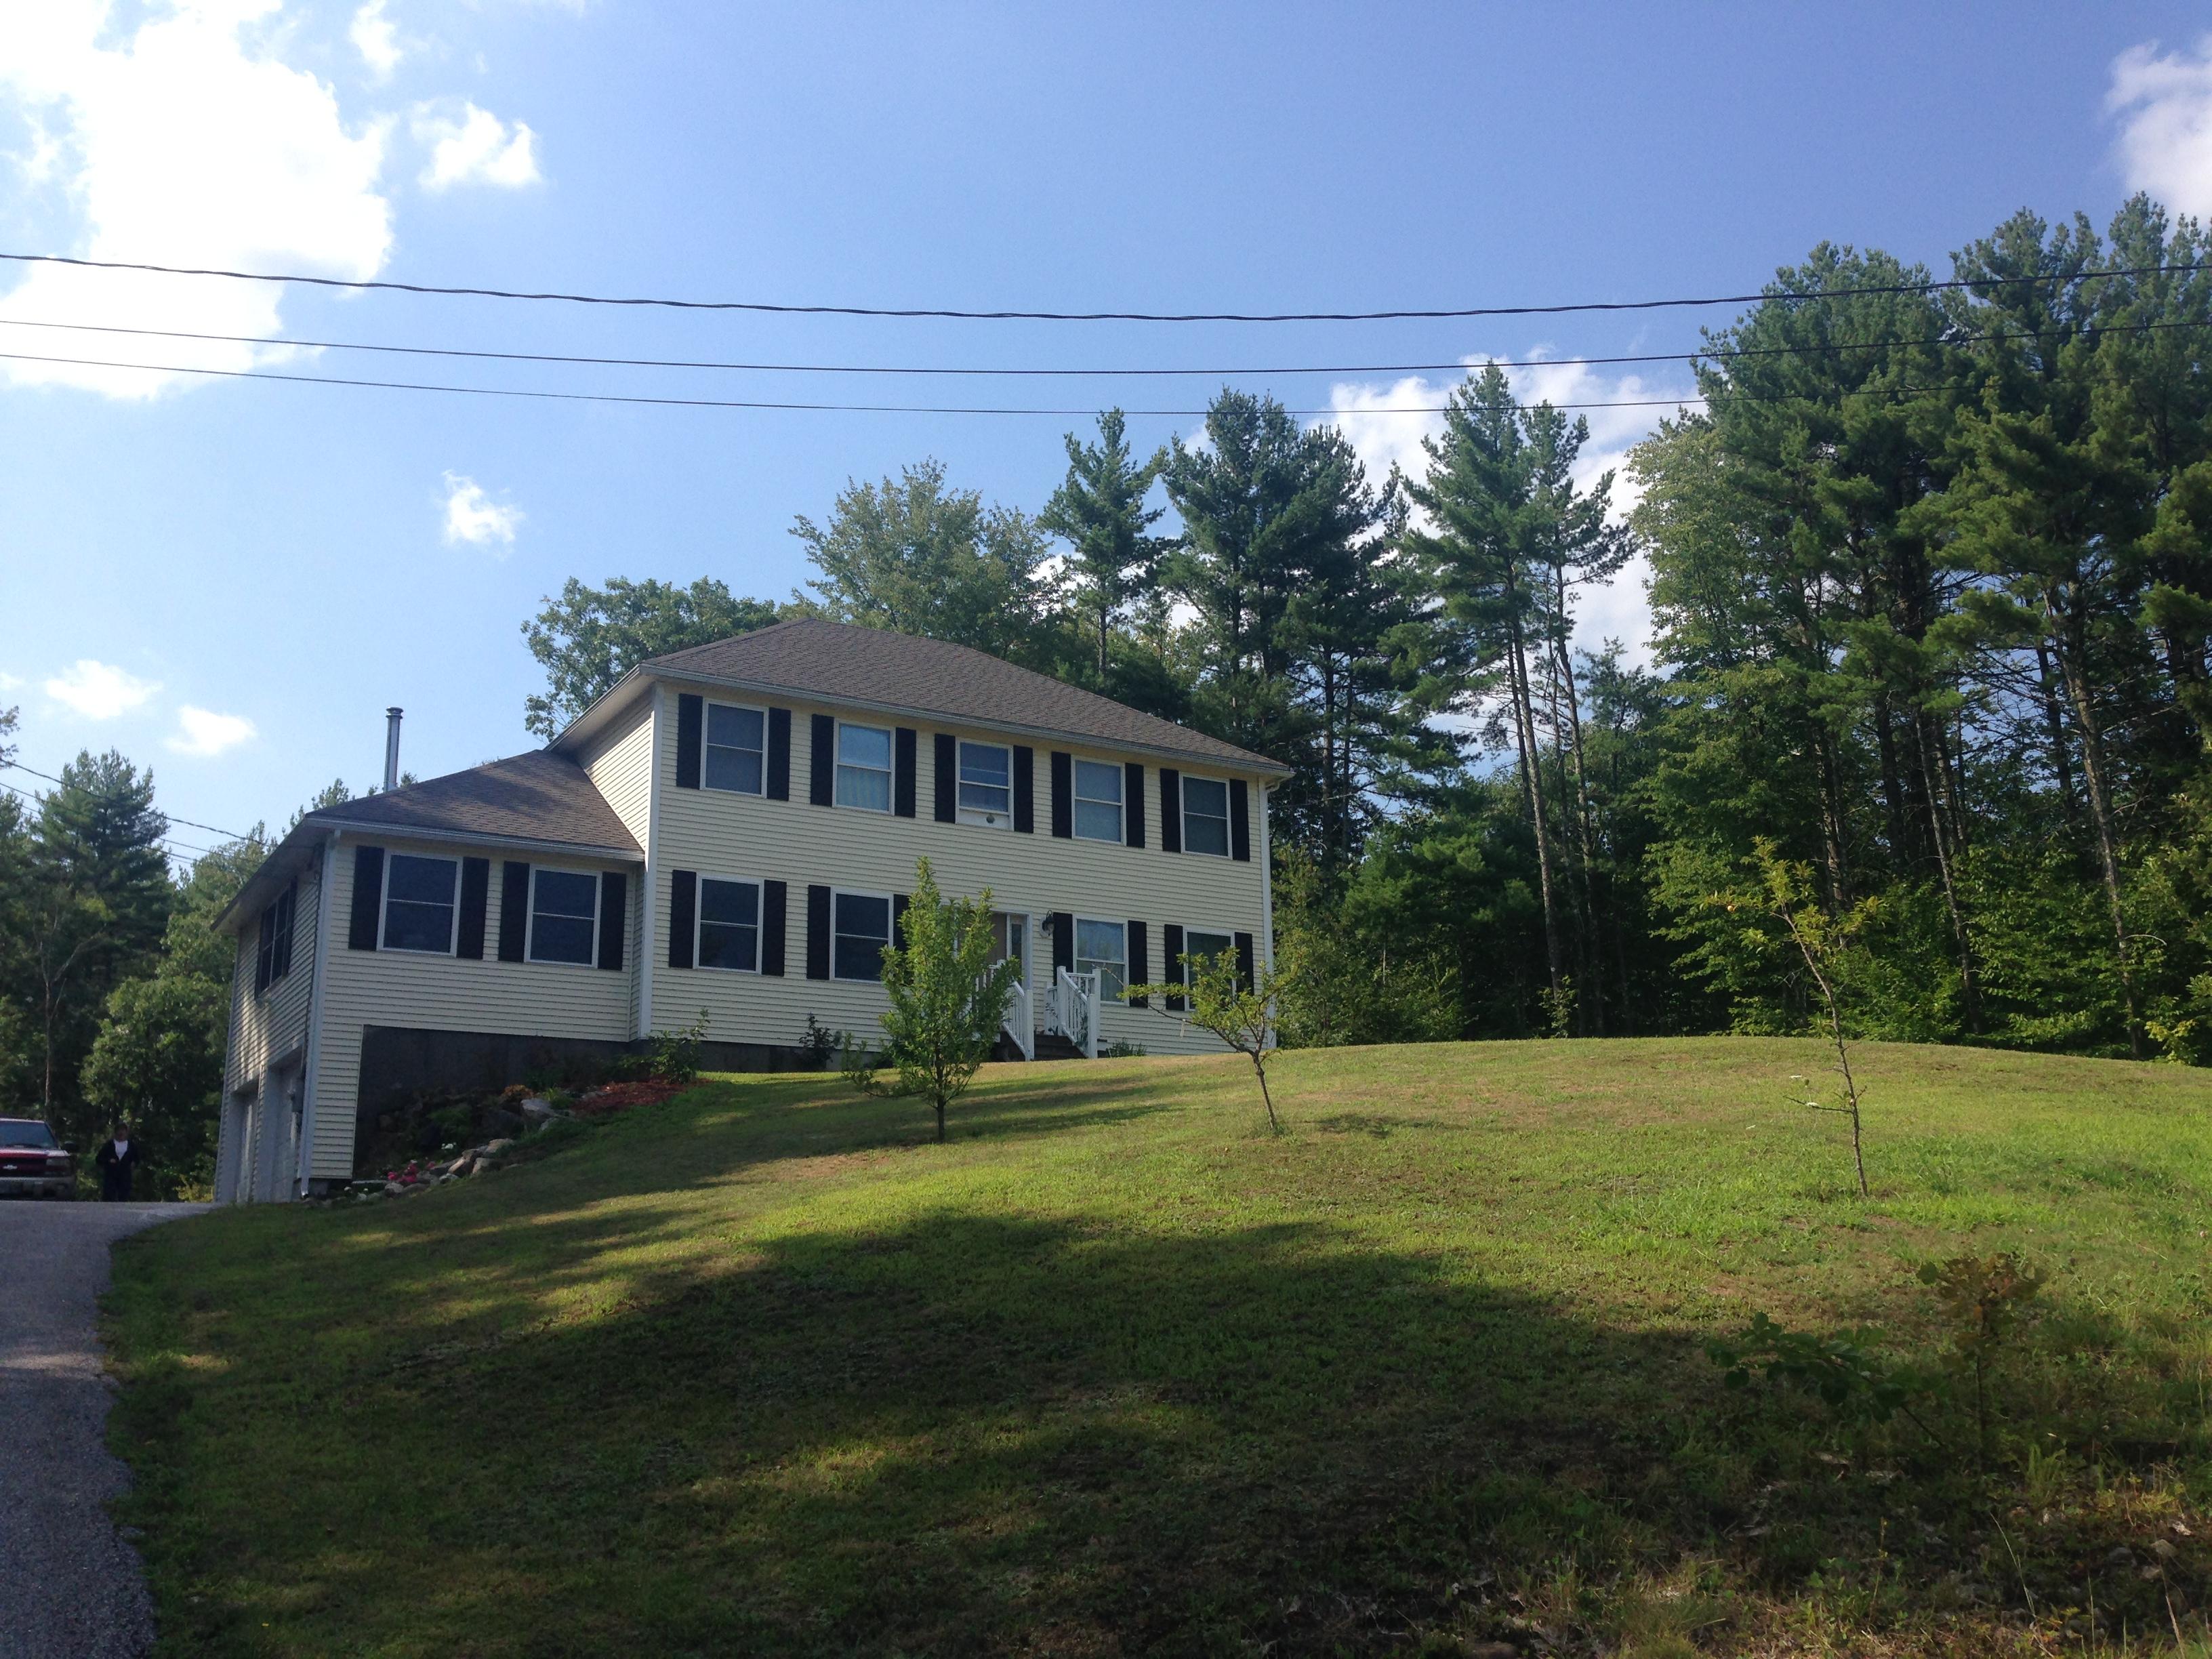 77 Raymond Rd., Deerfield, New Hampshire 03037